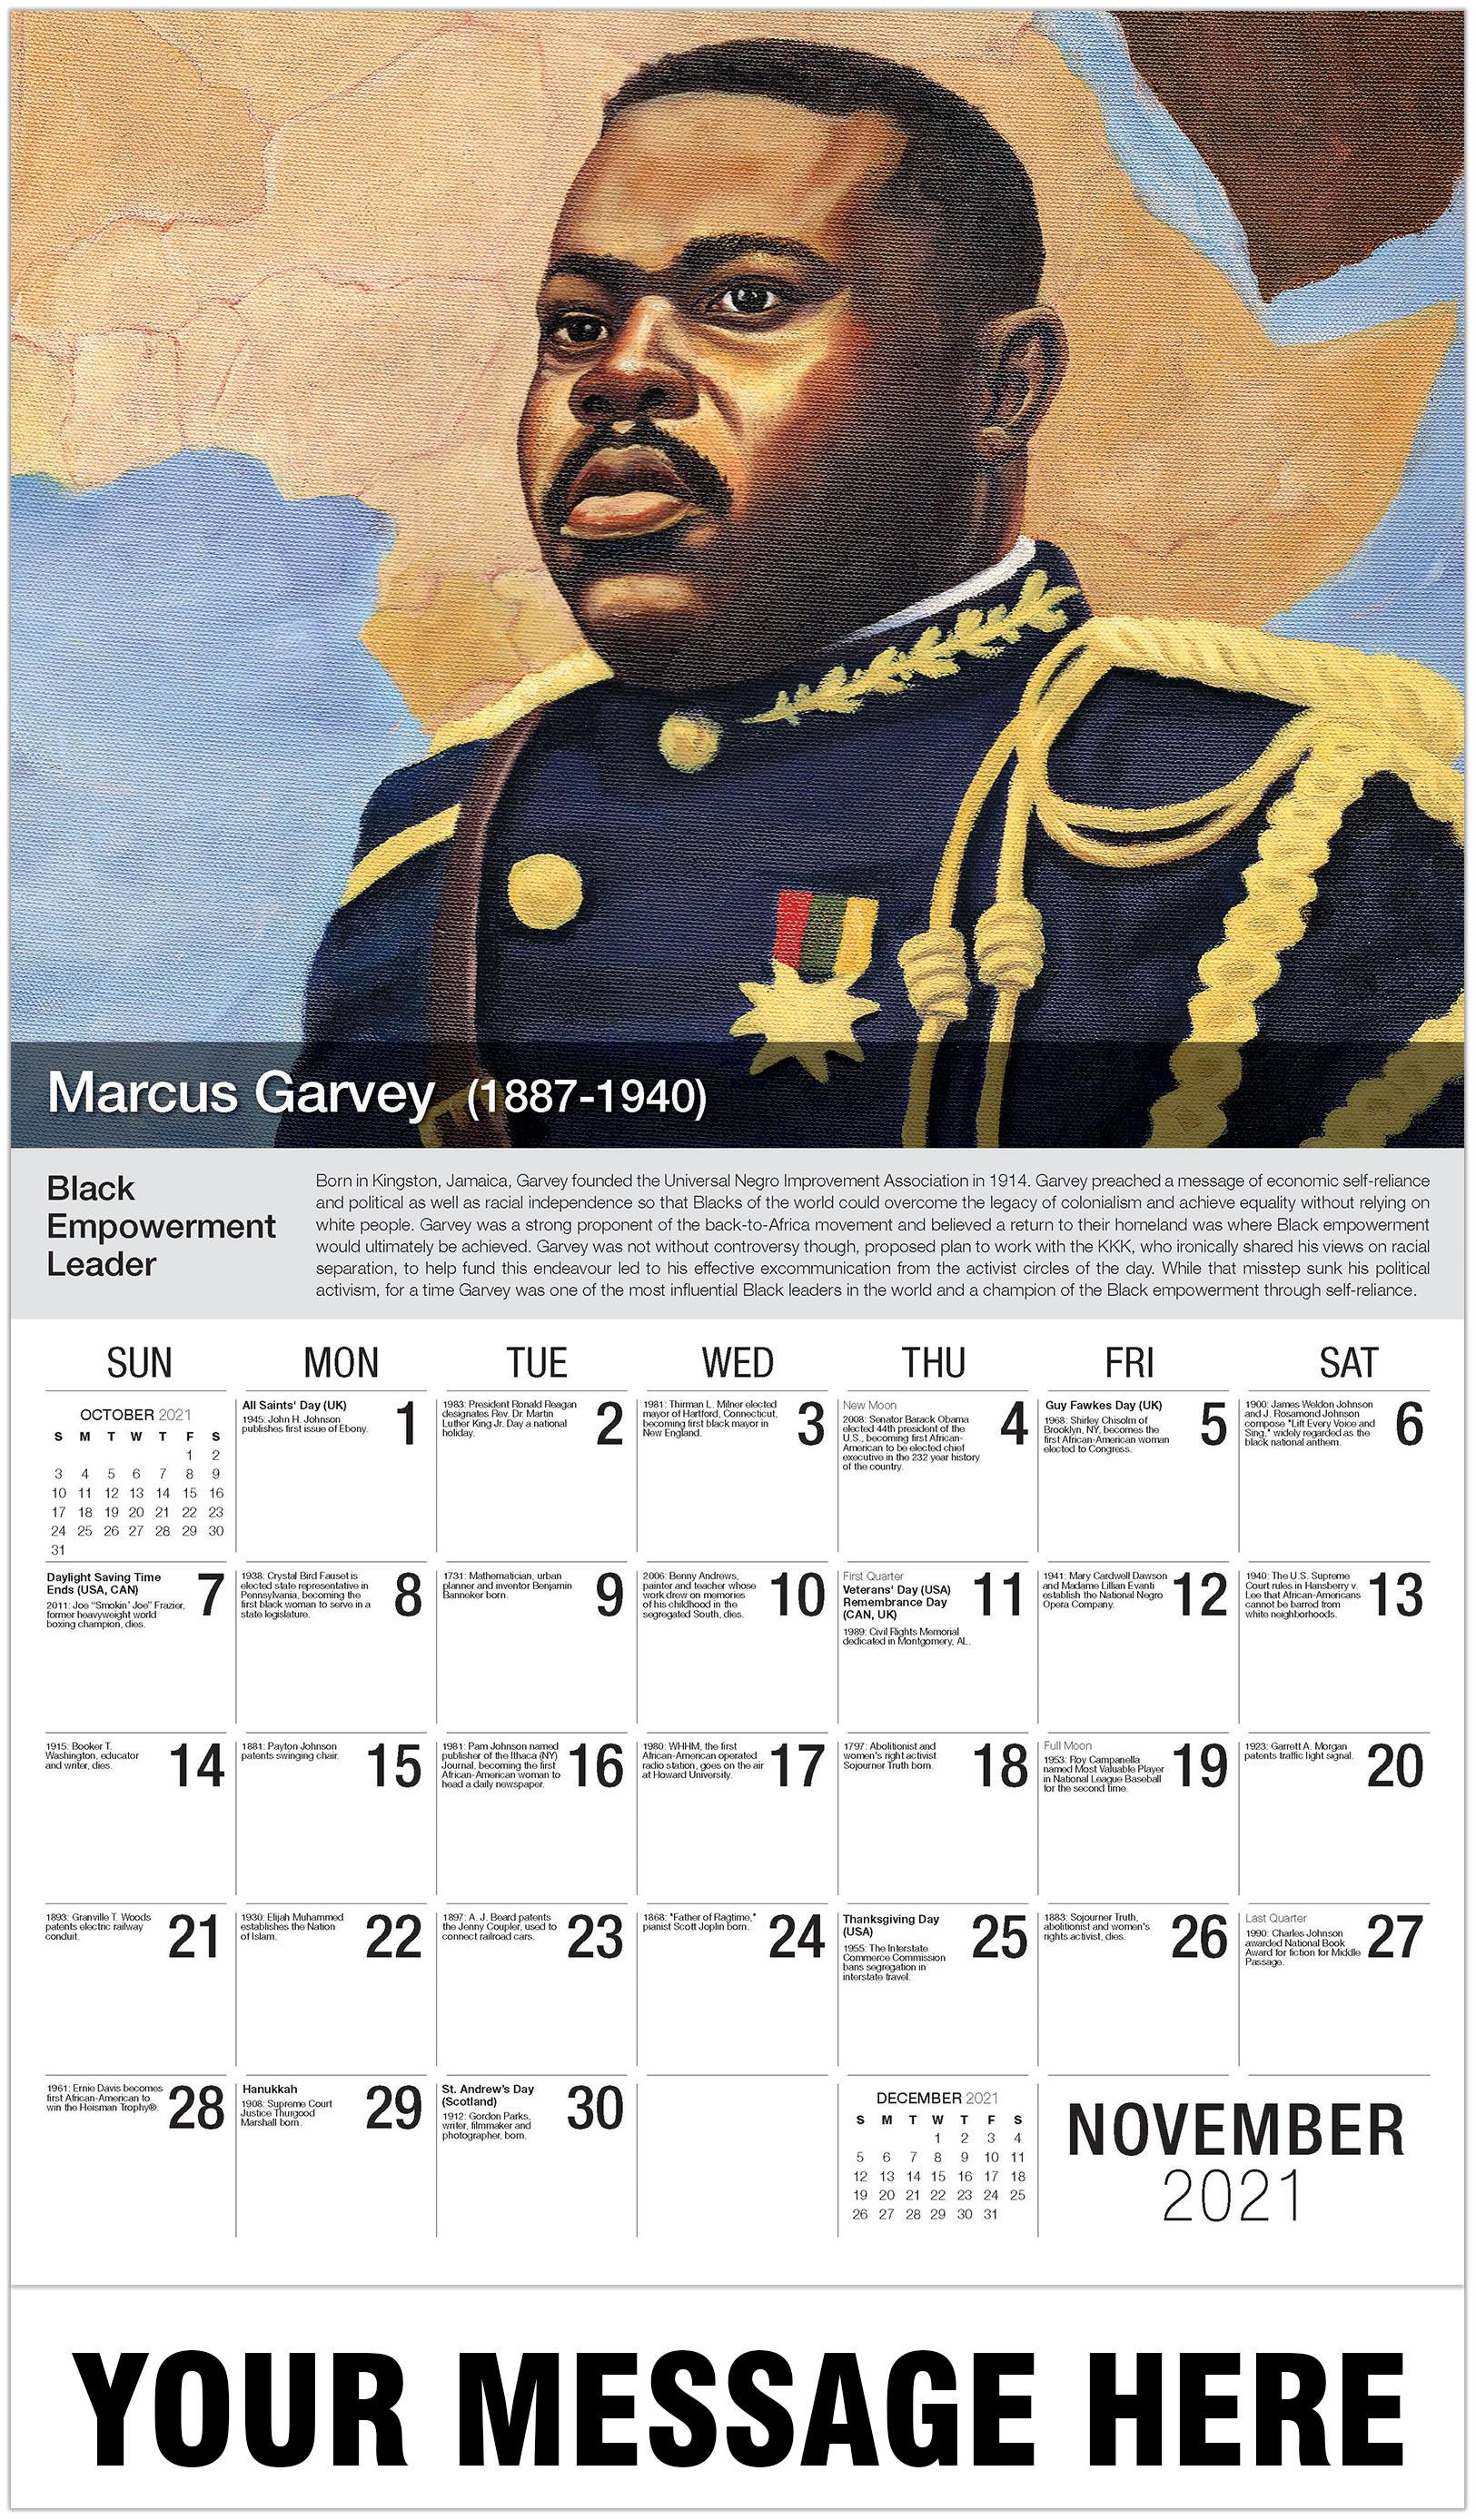 Marcus Garvey - November - Black History 2021 Promotional Calendar